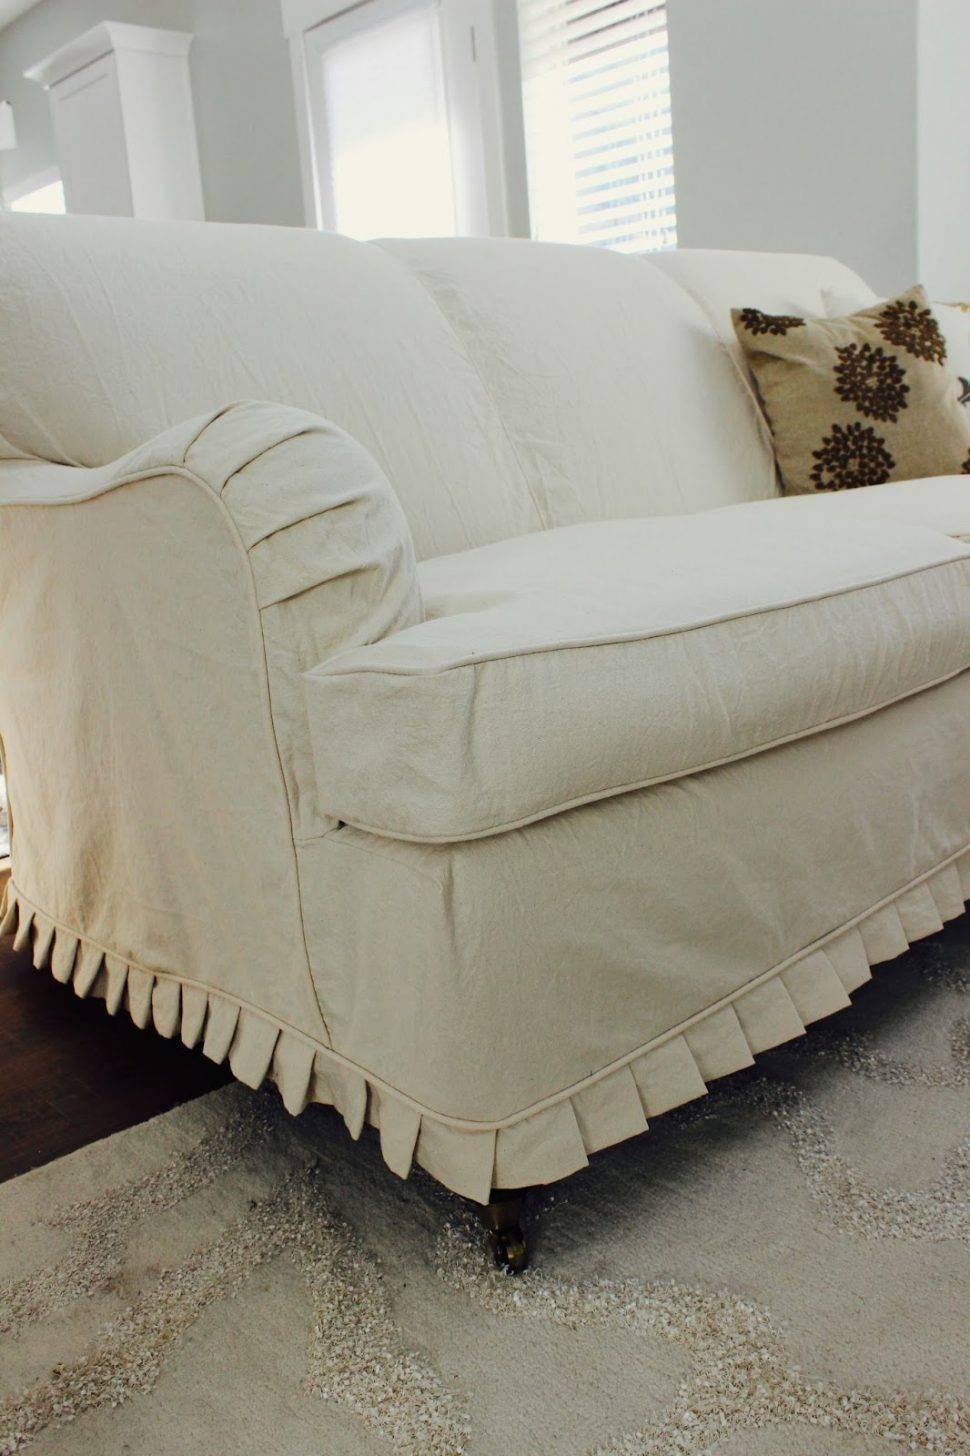 ▻ Sofa : 31 Lovely Oversized Sofa Covers Slipcover Ideas 1000 throughout Large Sofa Slipcovers (Image 28 of 30)